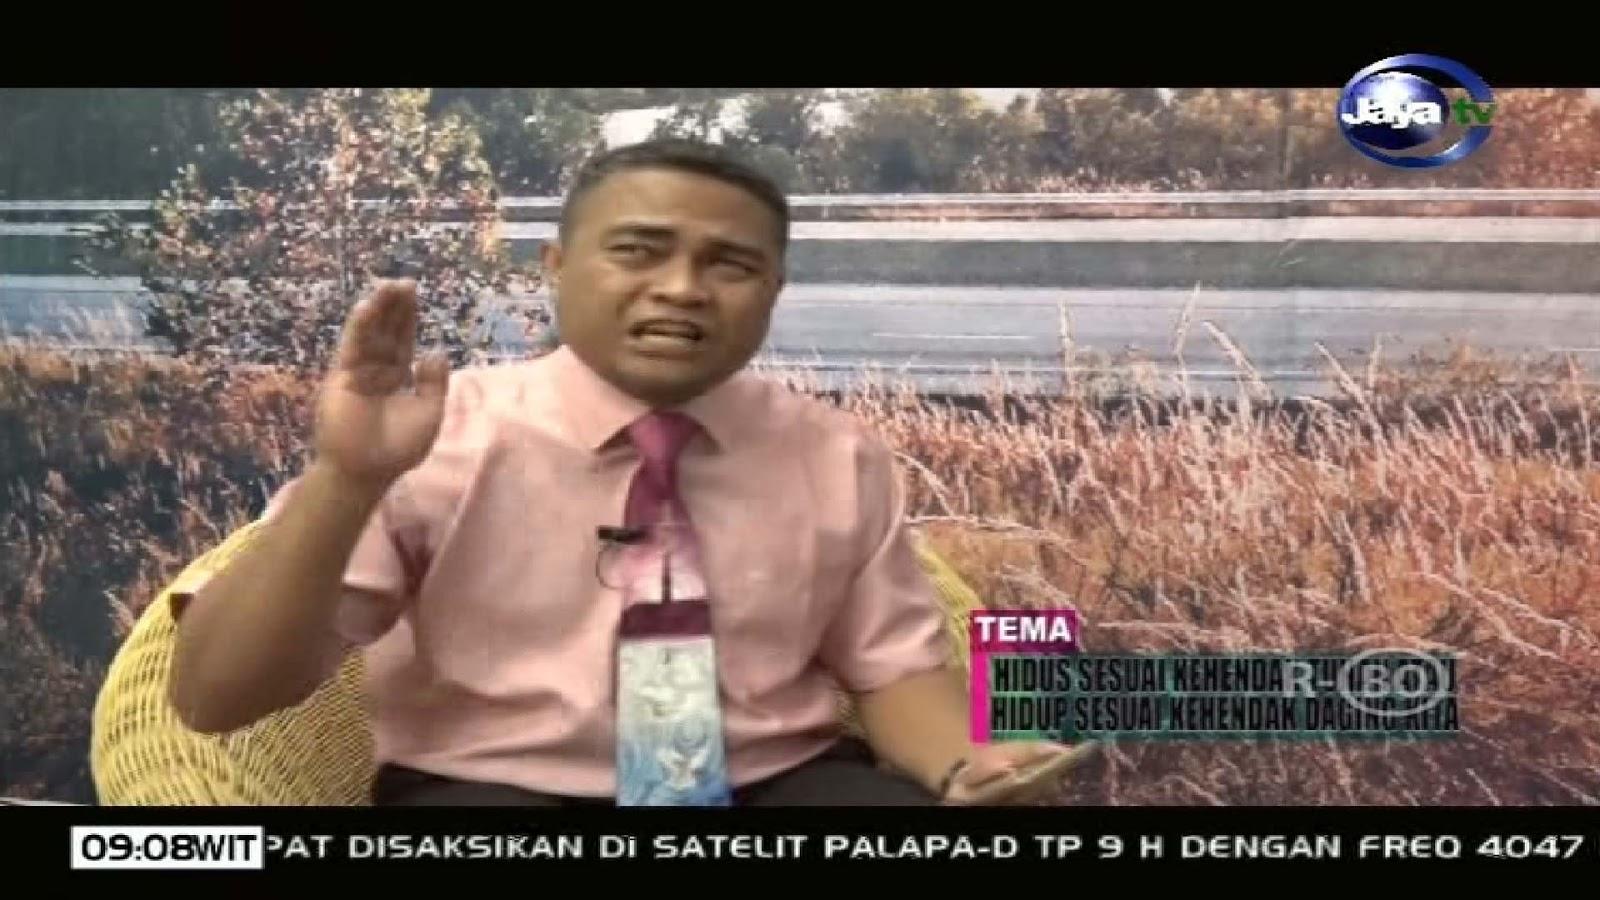 Frekuensi siaran Jaya TV di satelit Palapa D Terbaru